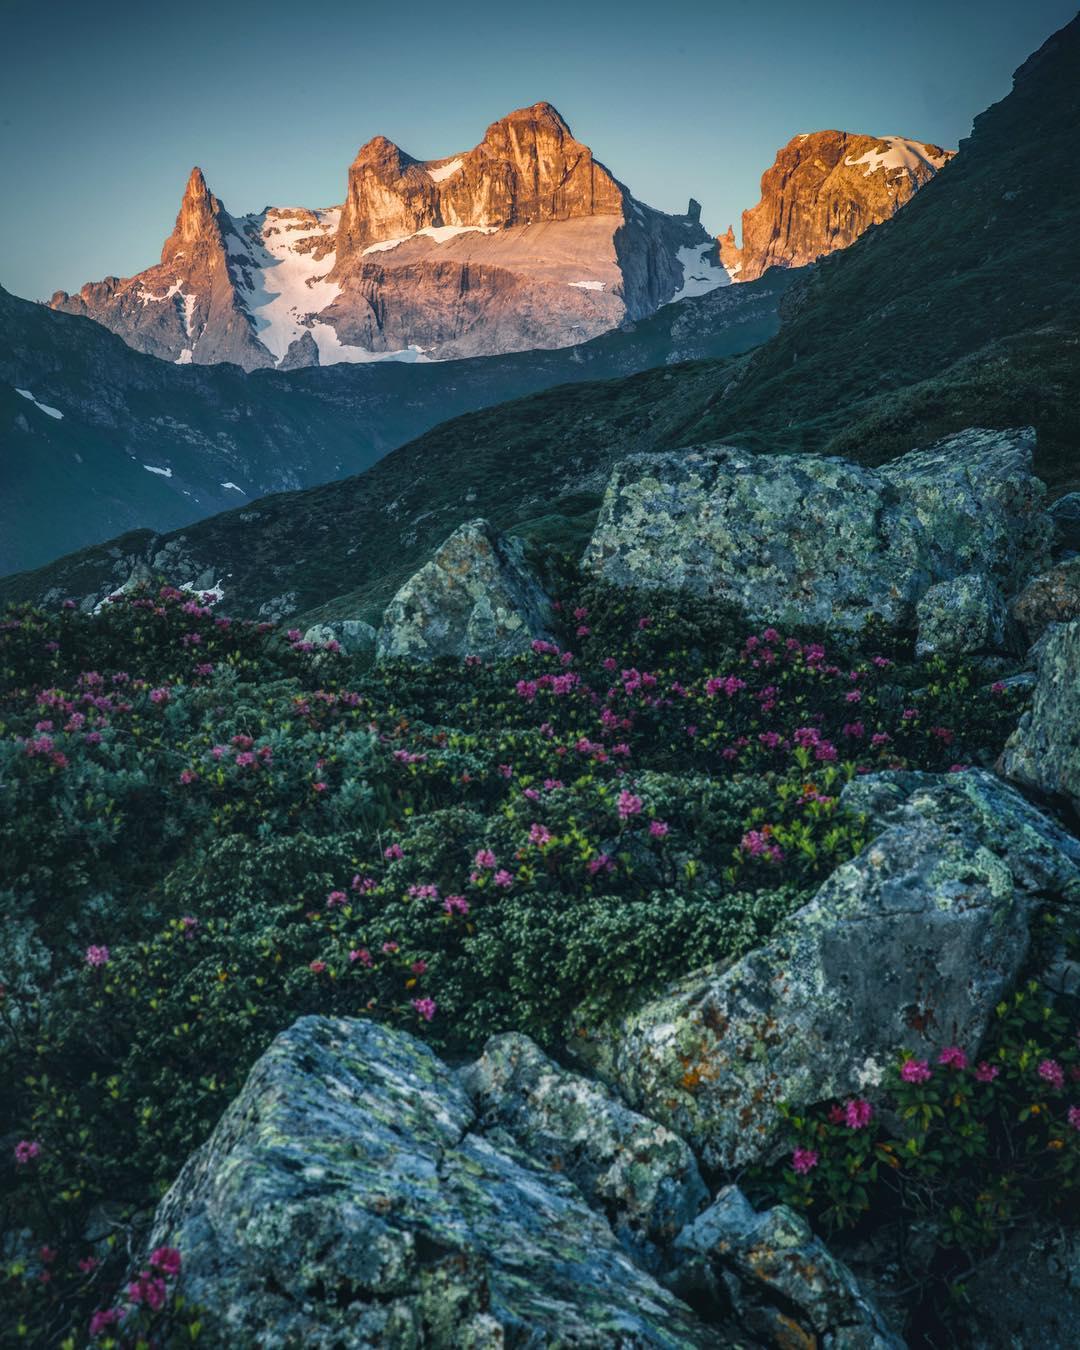 The three towers, adventure mountain Golm Montafon